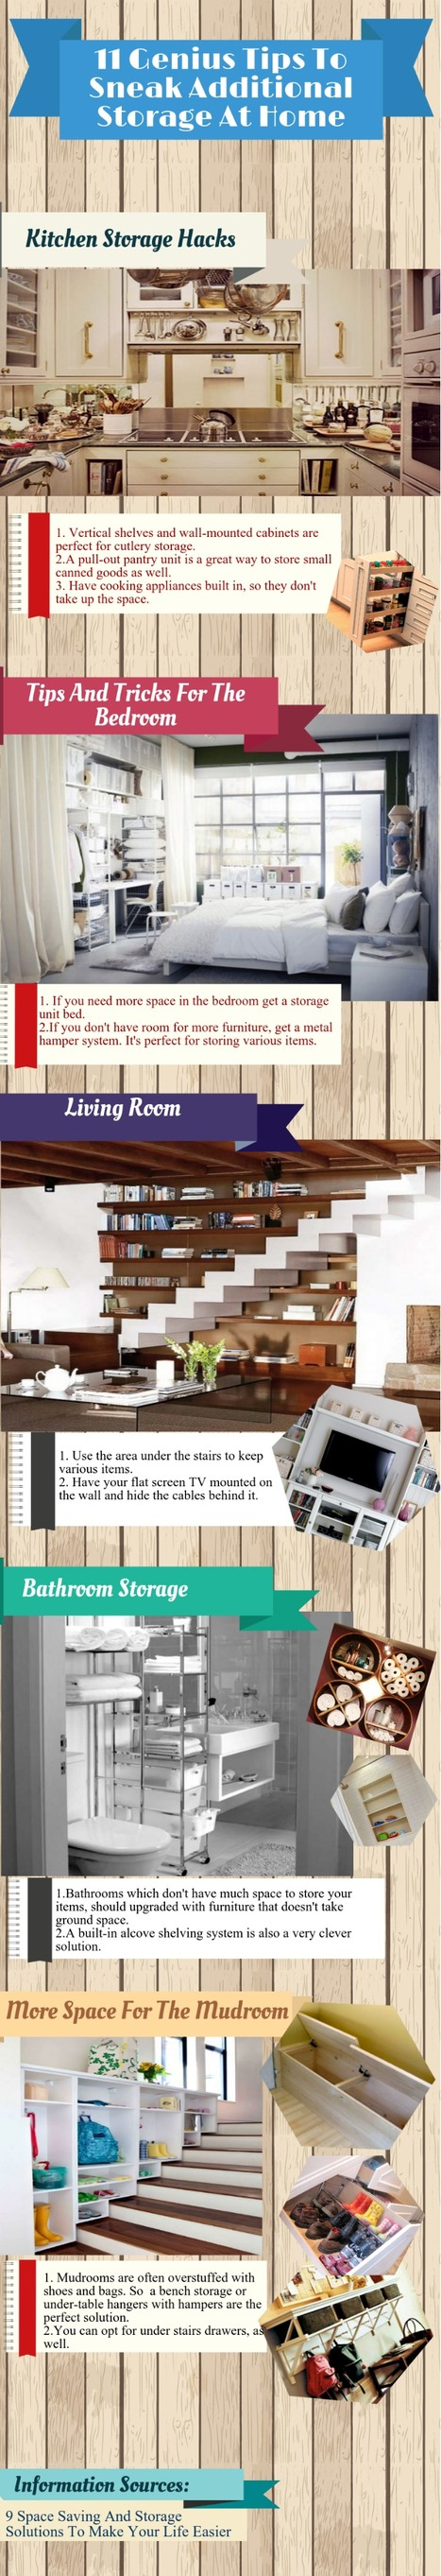 Behance | DIY Projects, Home Improvement Tips, Energy Efficiency Pets | Scoop.it